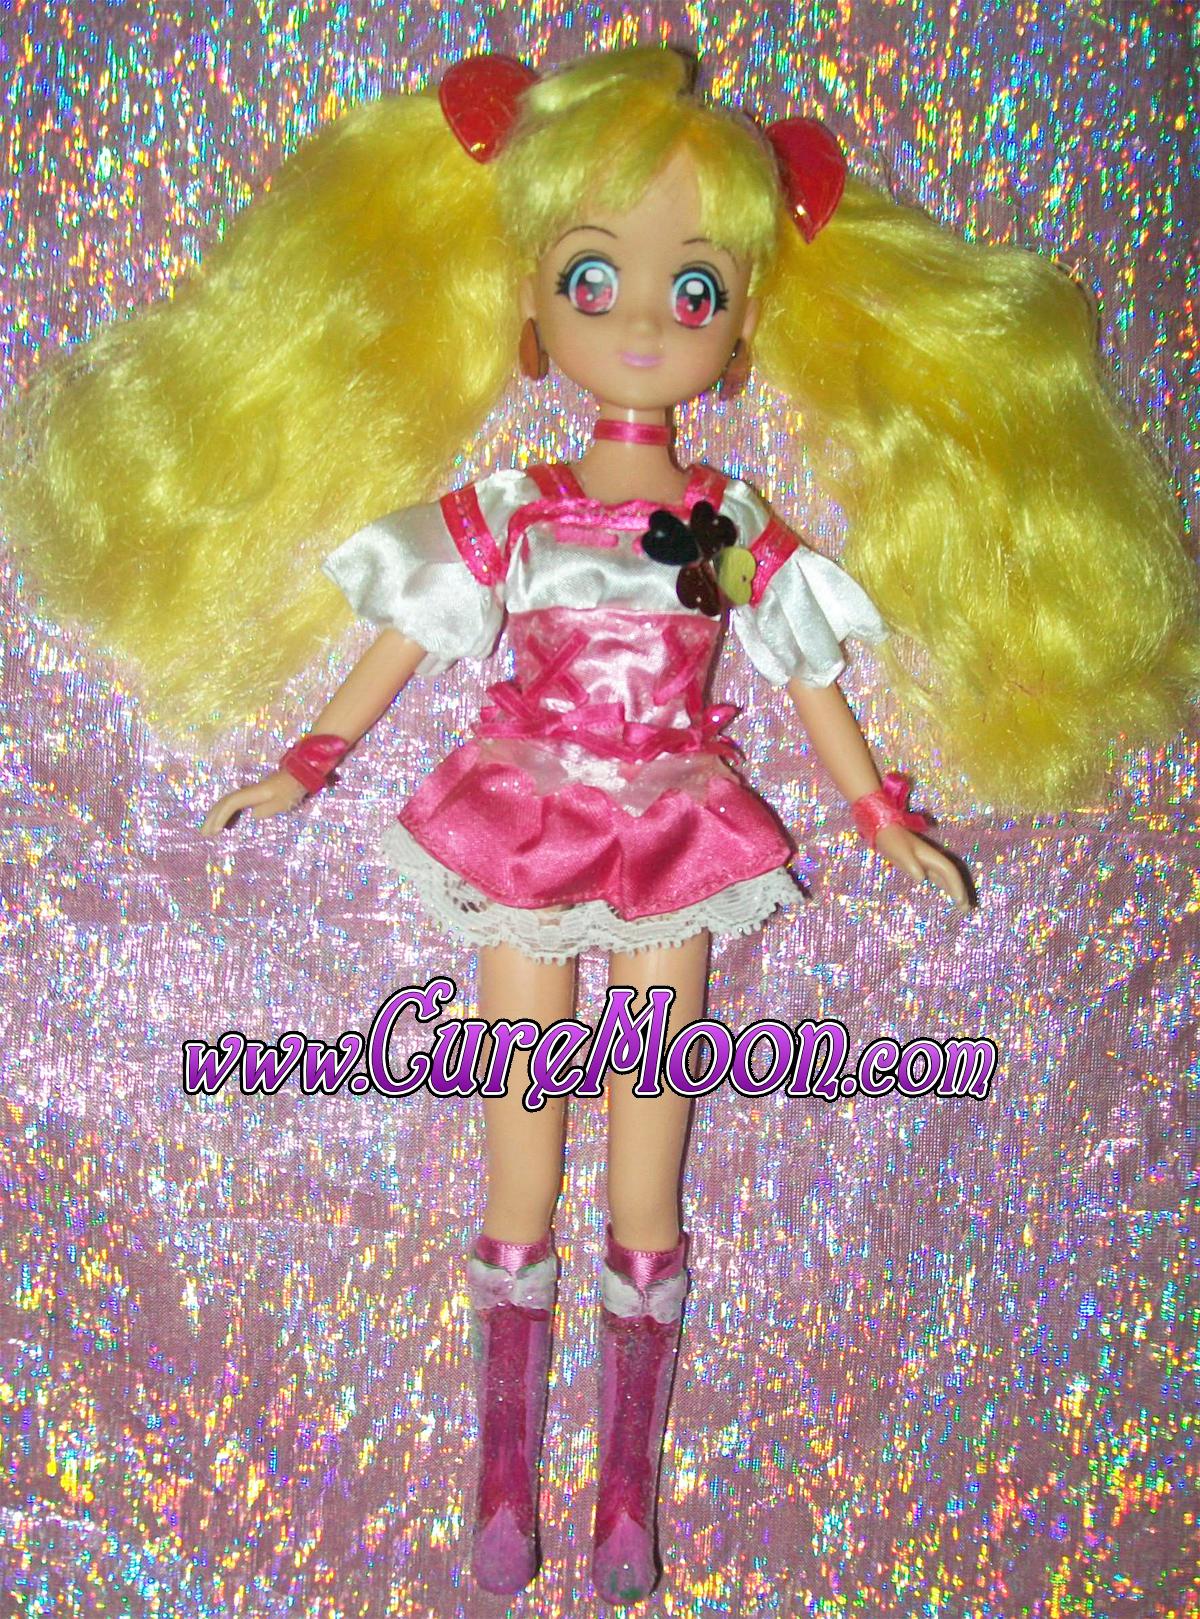 cure-peach-bambola-custom